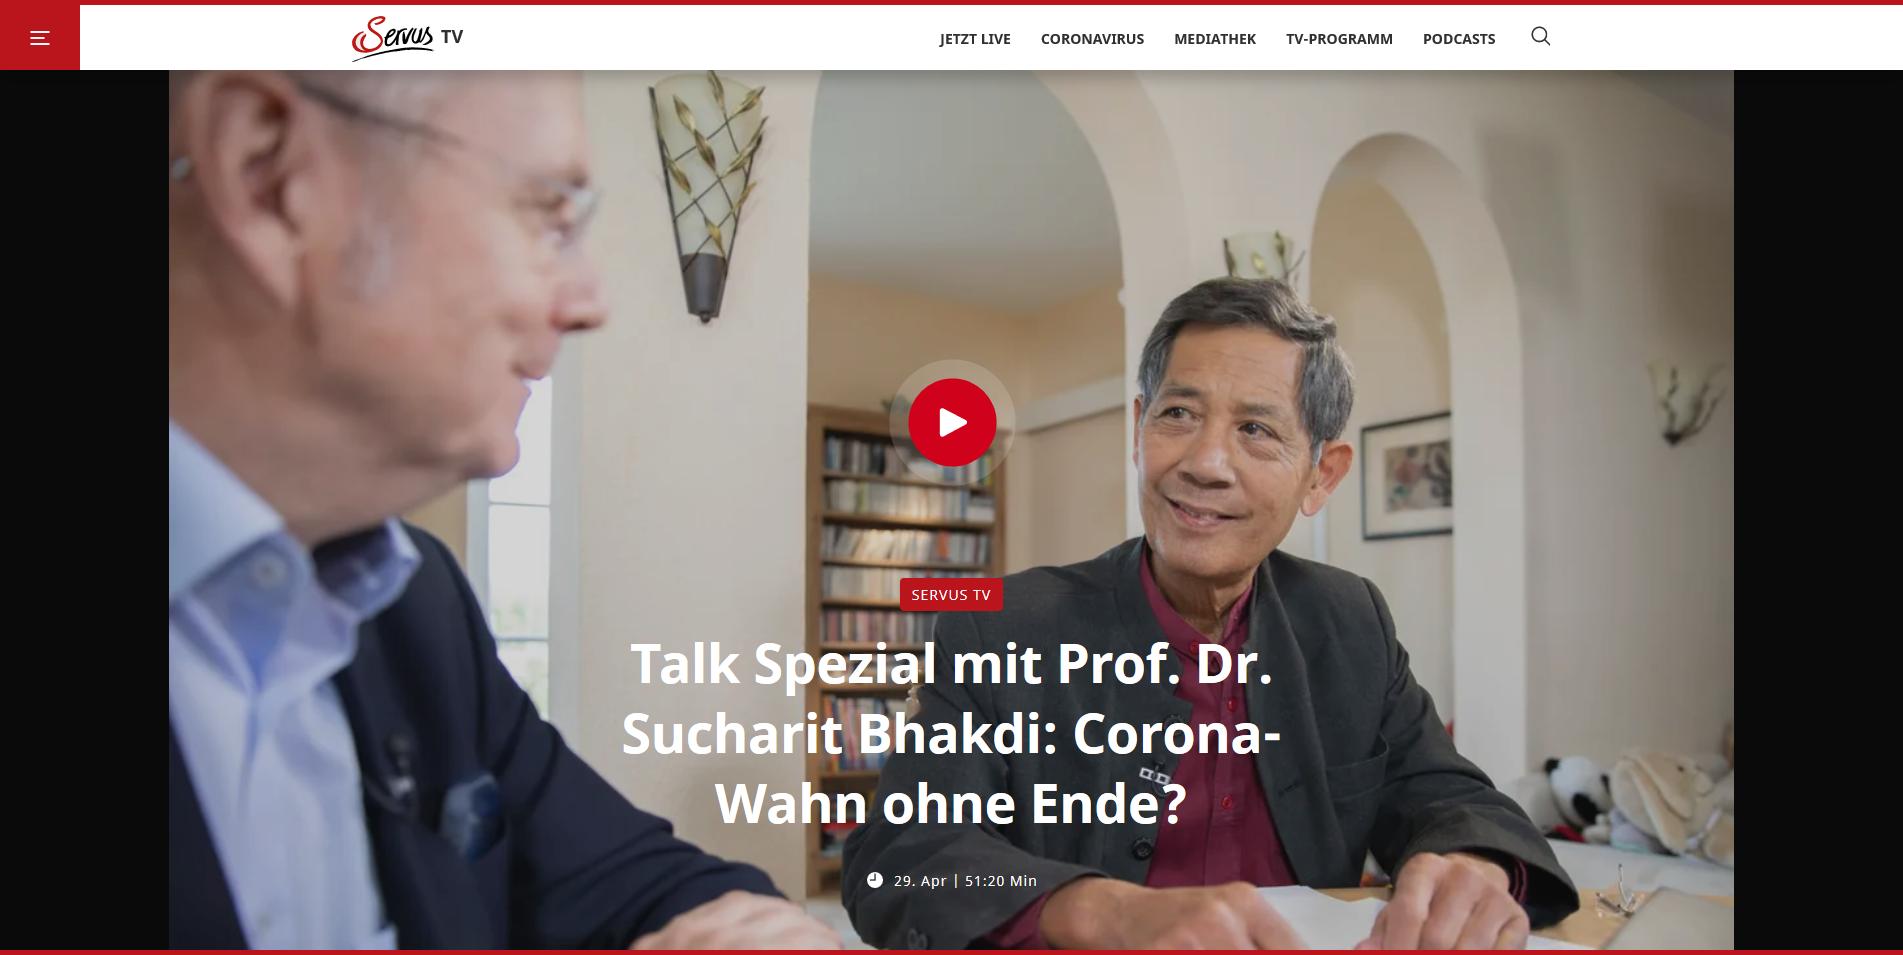 Screenshot_2020-04-30 Talk Spezial mit Prof Dr Sucharit Bhakdi Corona-Wahn ohne Ende - Servus TV